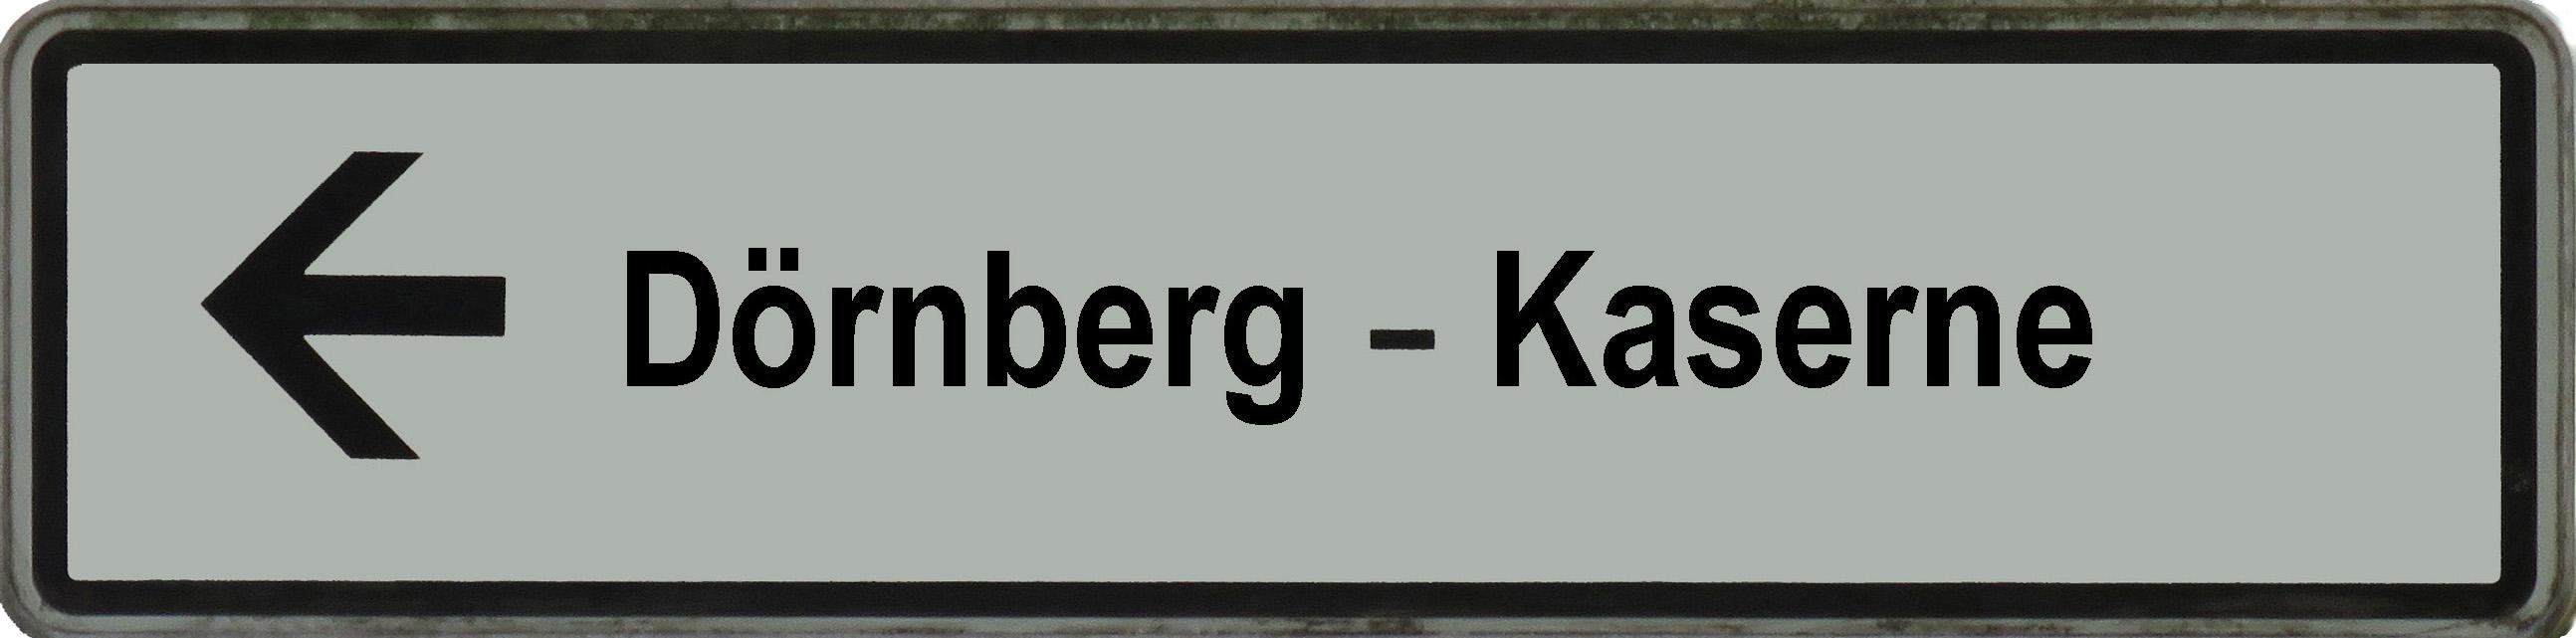 Schild Dörnberg-Kaserne